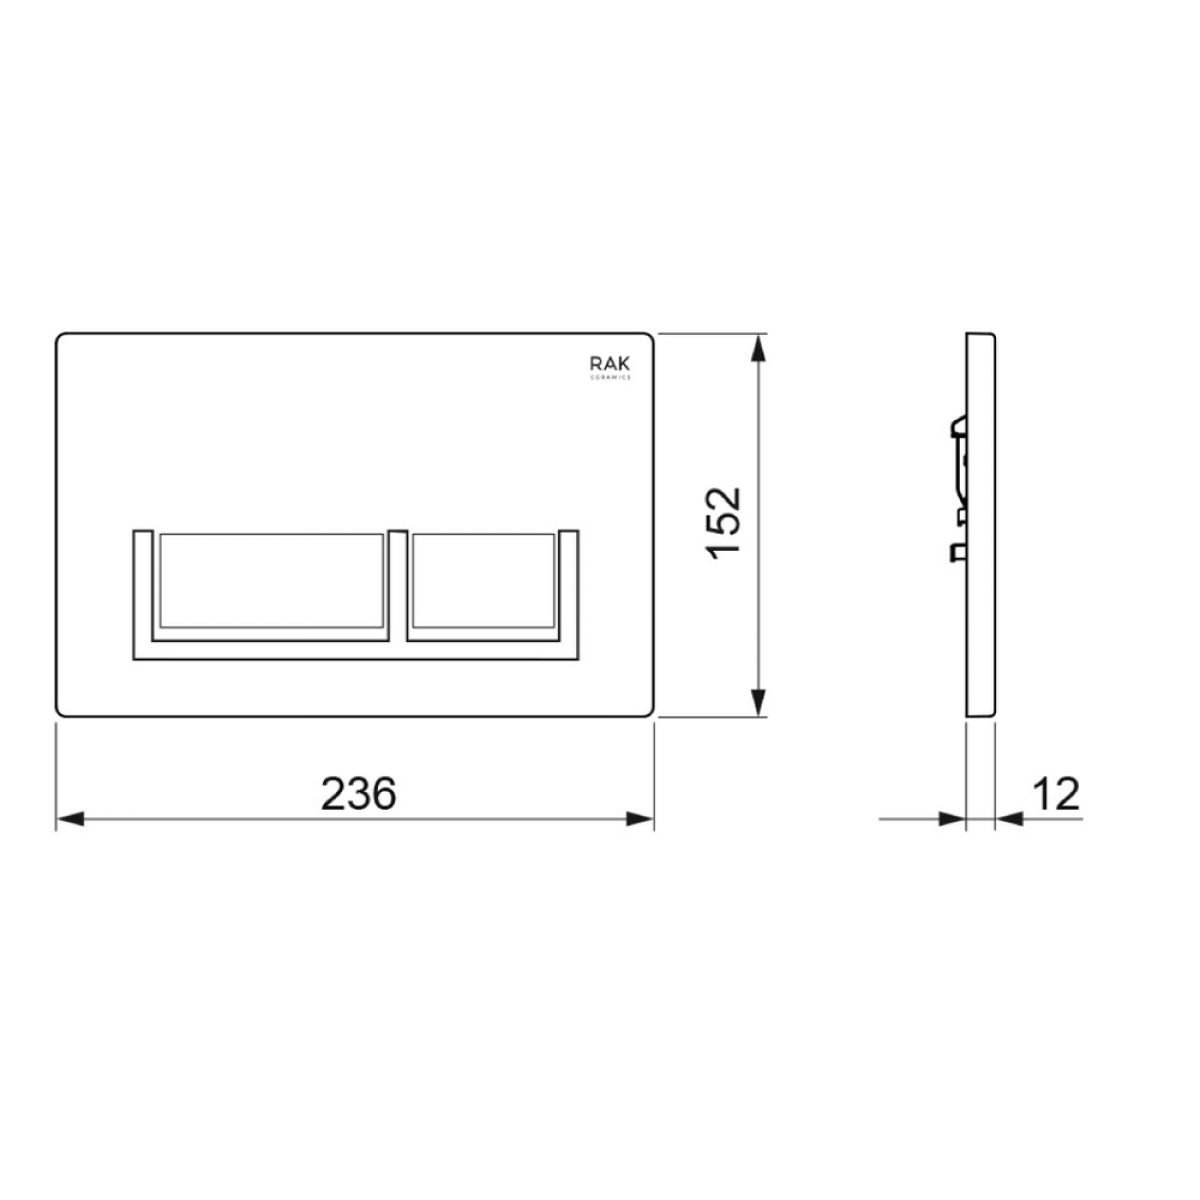 RAK Ecofix White Flush Plate with Surrounded Rectangular Push Buttons Measurements